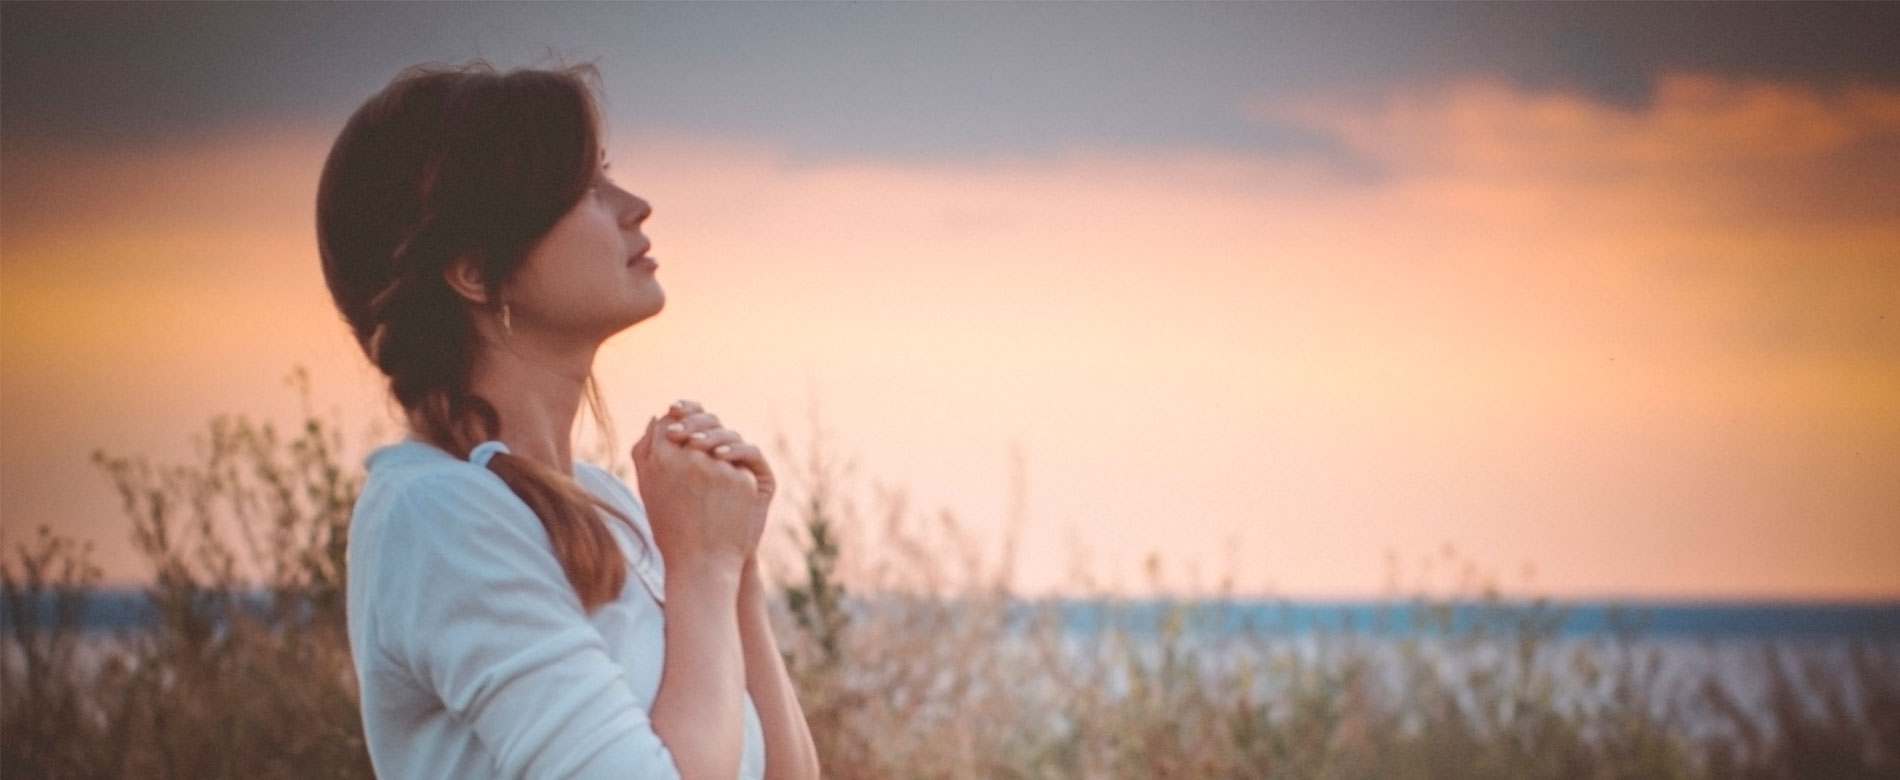 Servas em alerta – Desassossego da alma